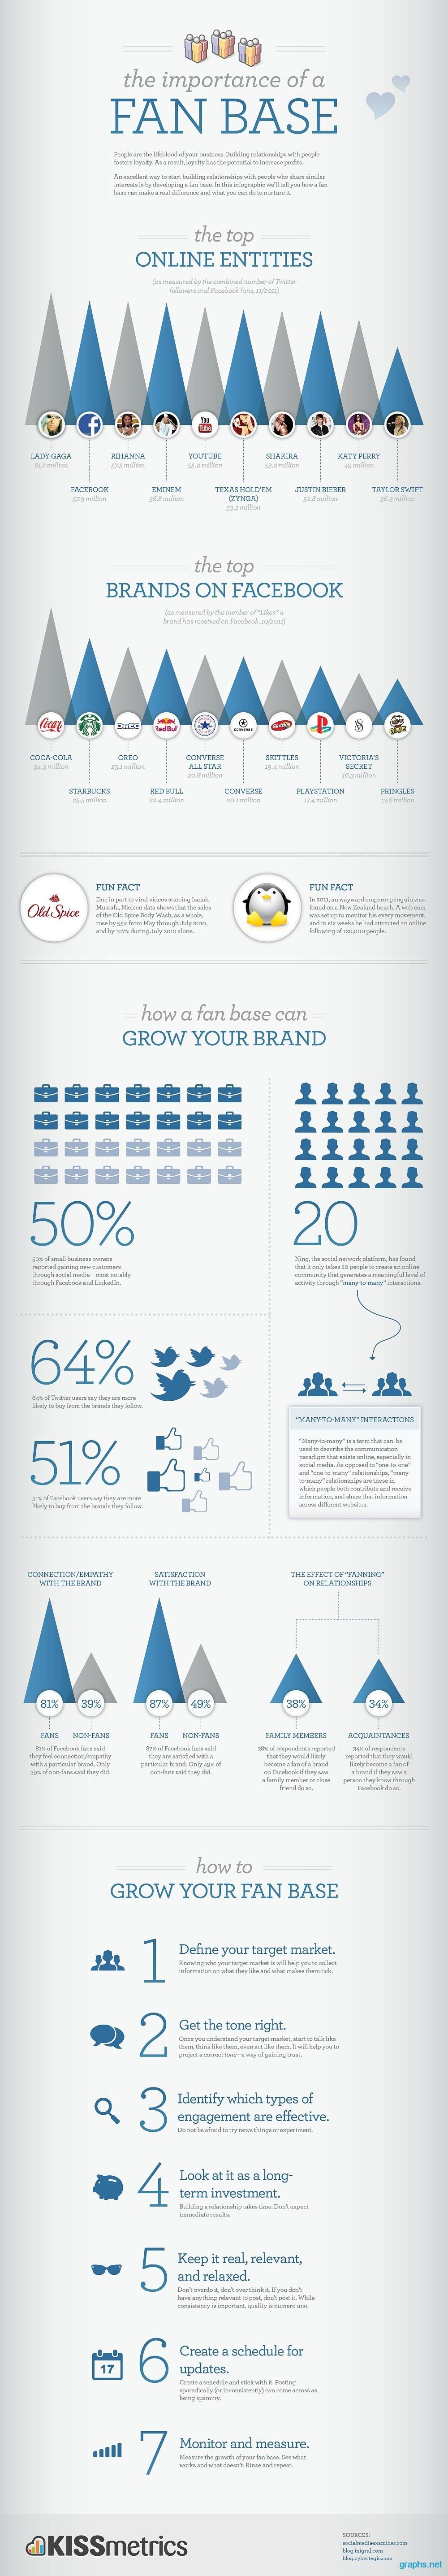 facebook fans statistics